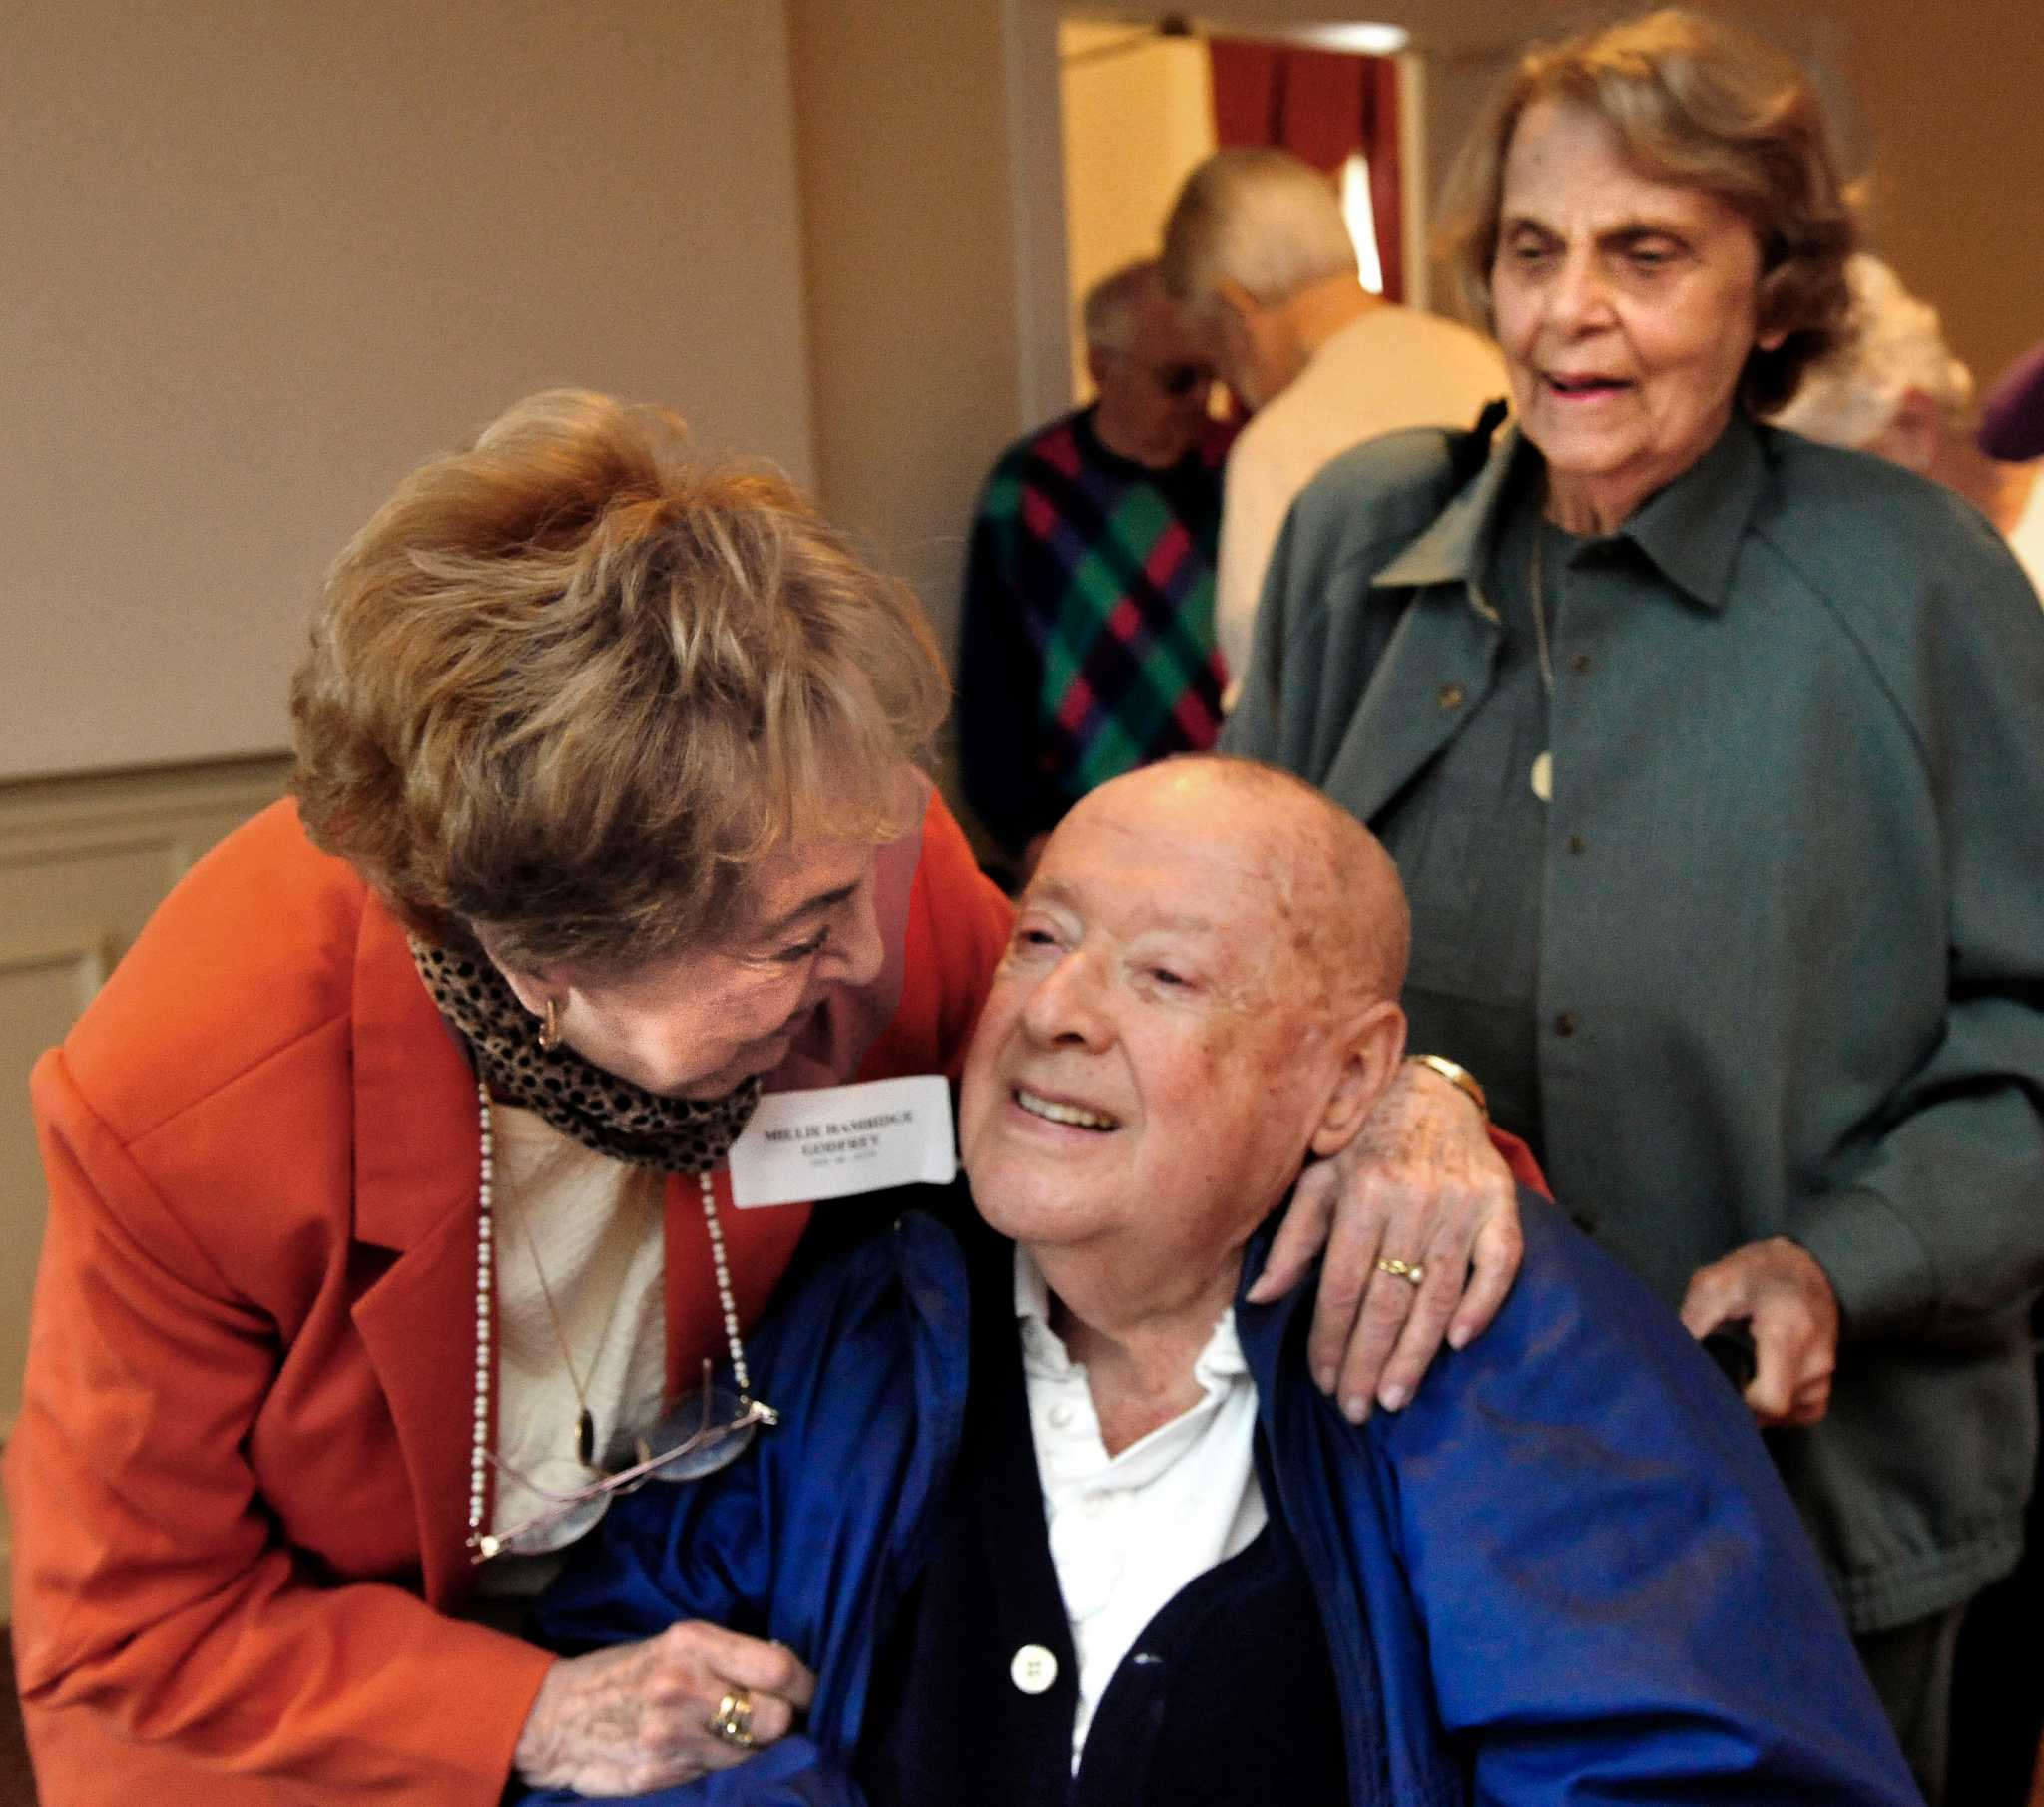 Danbury Class Of '48 Celebrates 65th Reunion